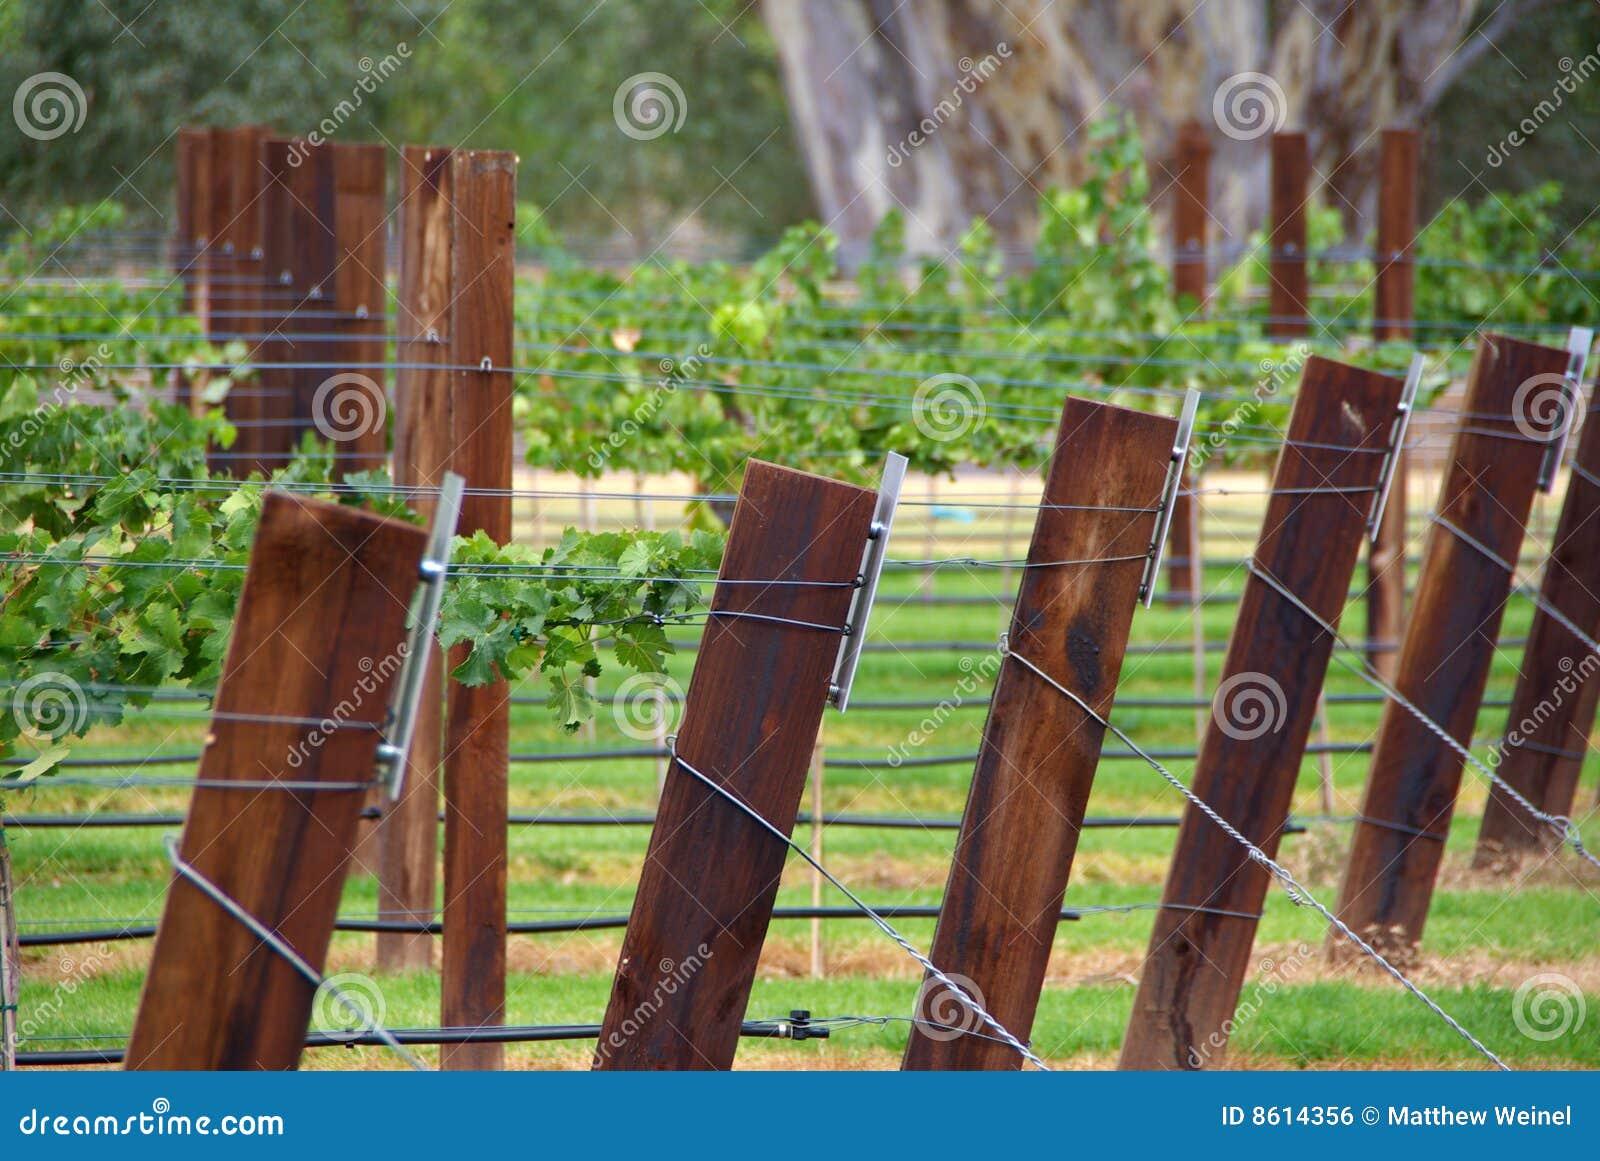 Vineyard Trellis Stock Photo Image Of Tourism Winery